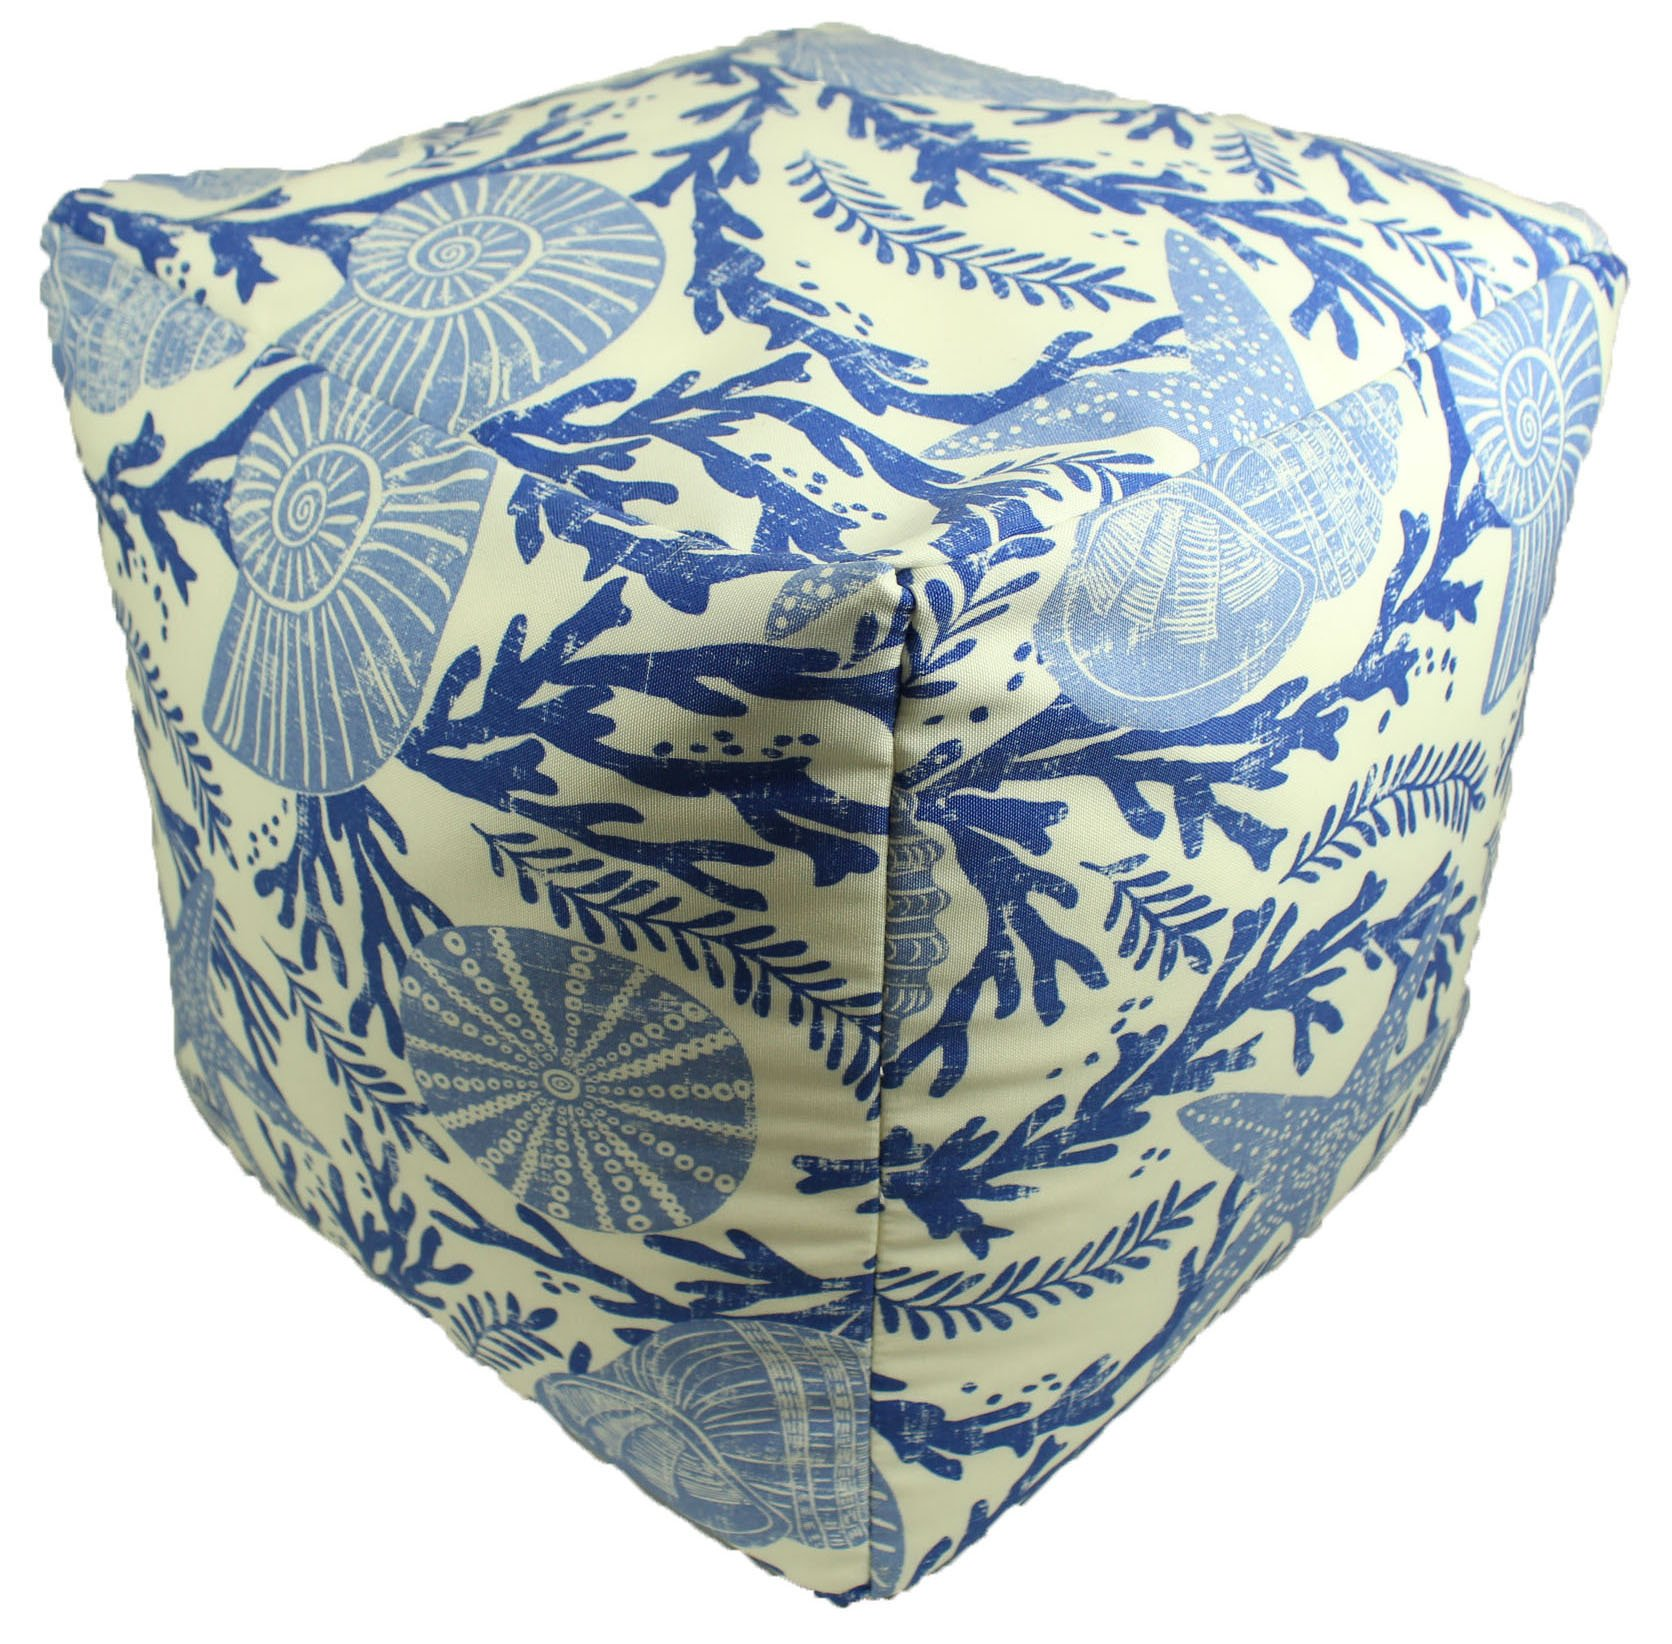 Lava Polyester Ottomans 46874-999 Vintage Shells Pouf 17X17 Poufs/Outdoor Pouf 17 X 17 X 17 Inches Multicolored